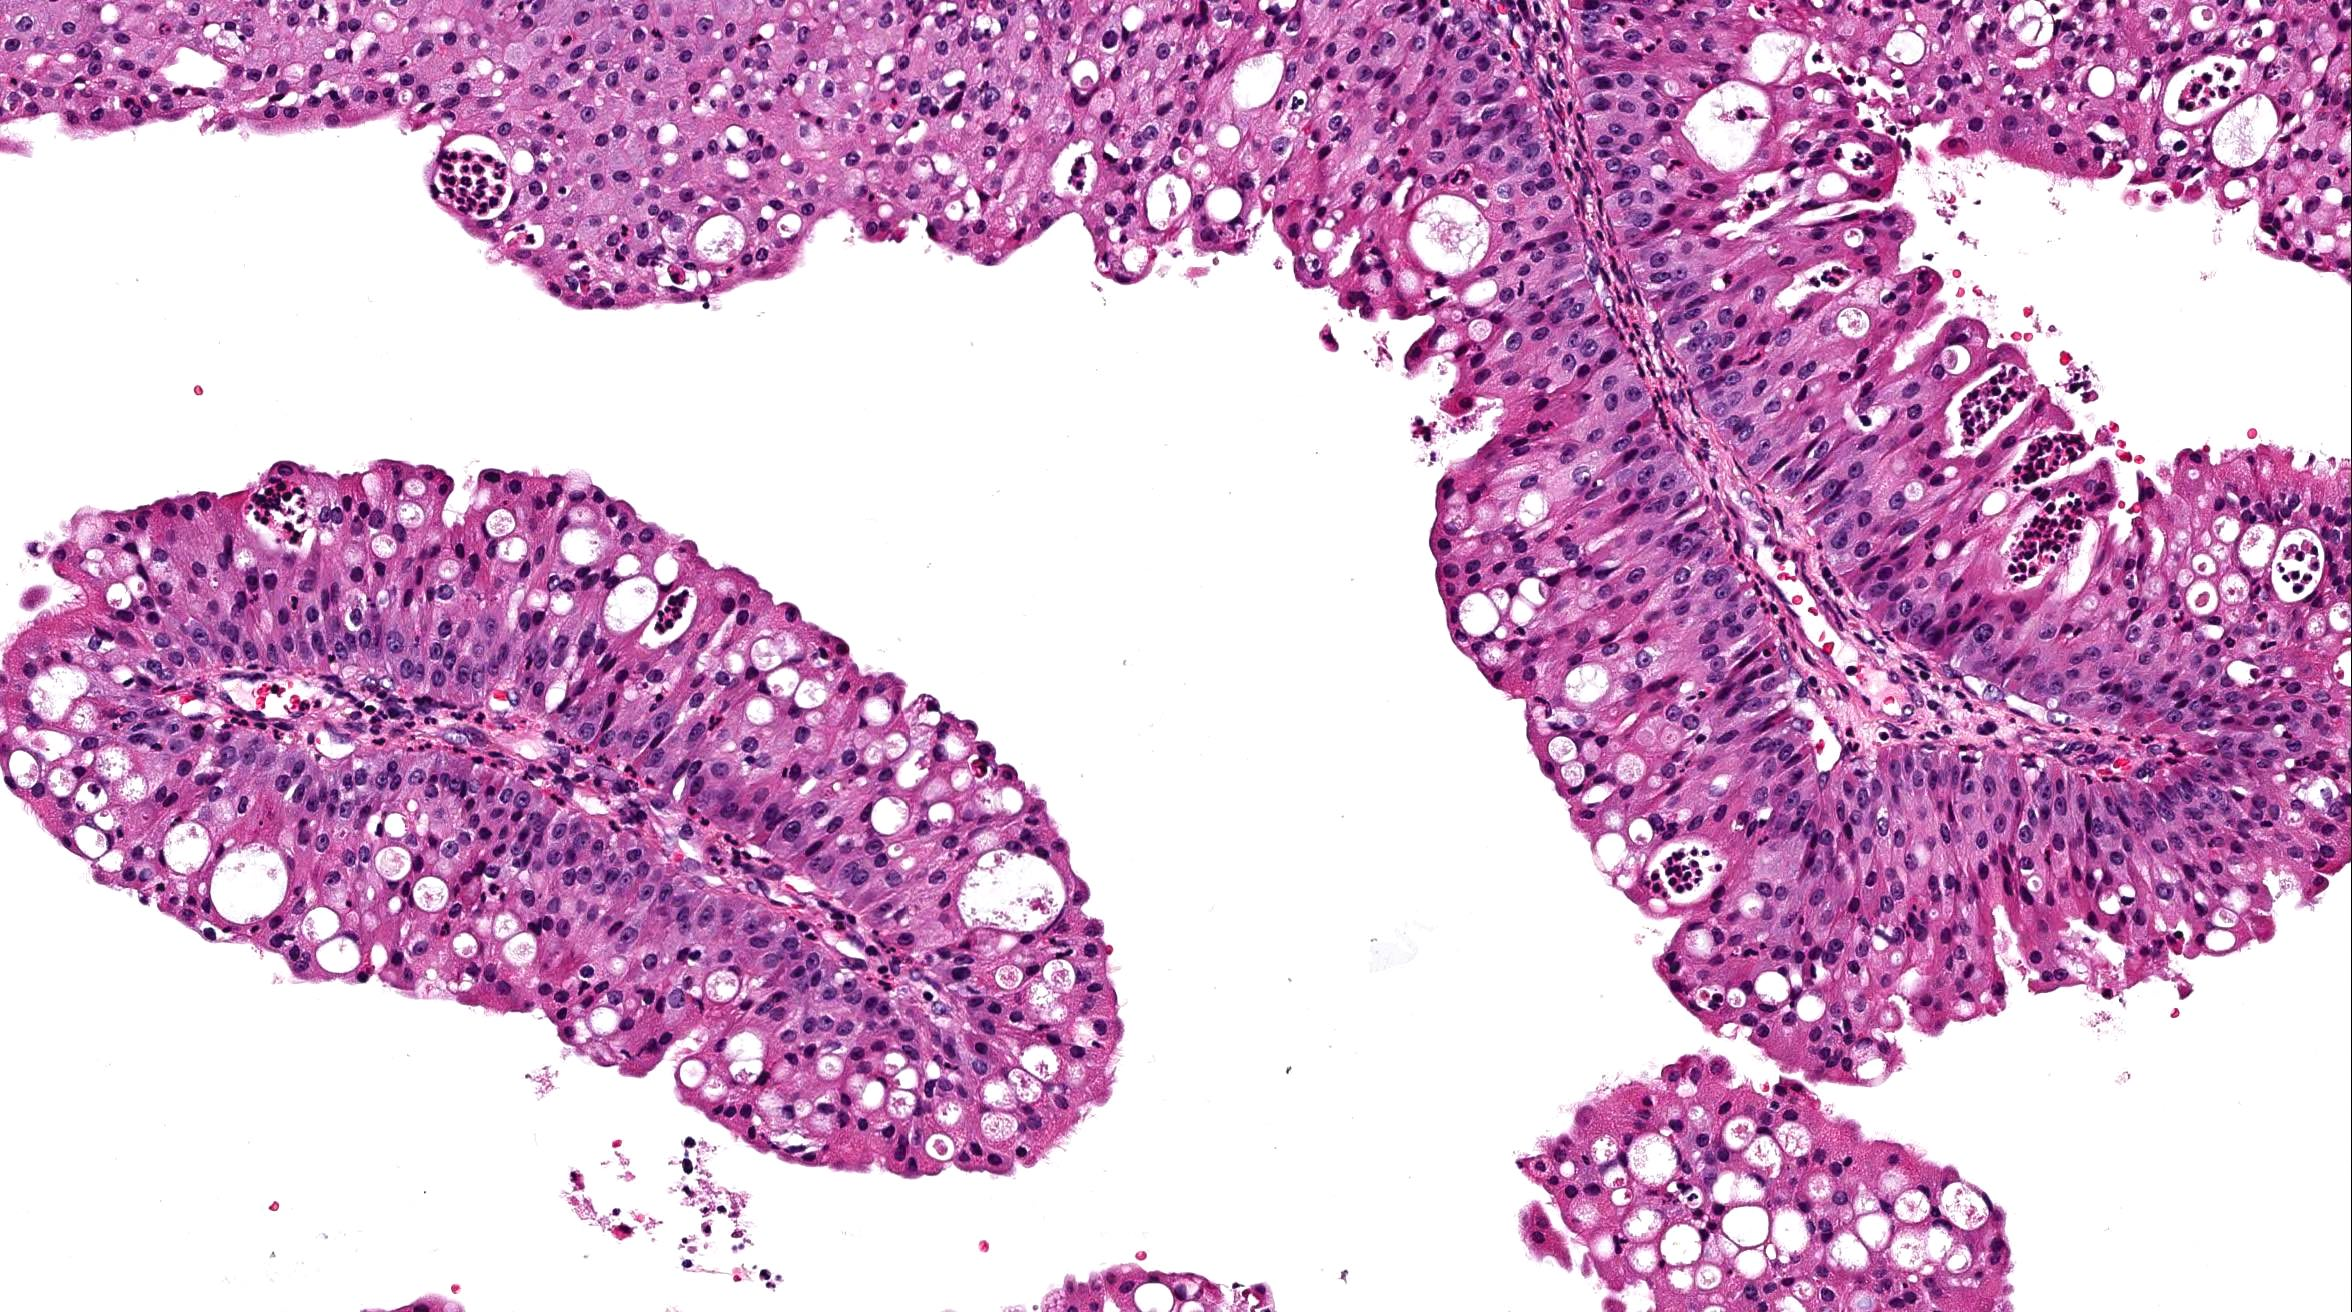 vestibular papillomatosis histopathology